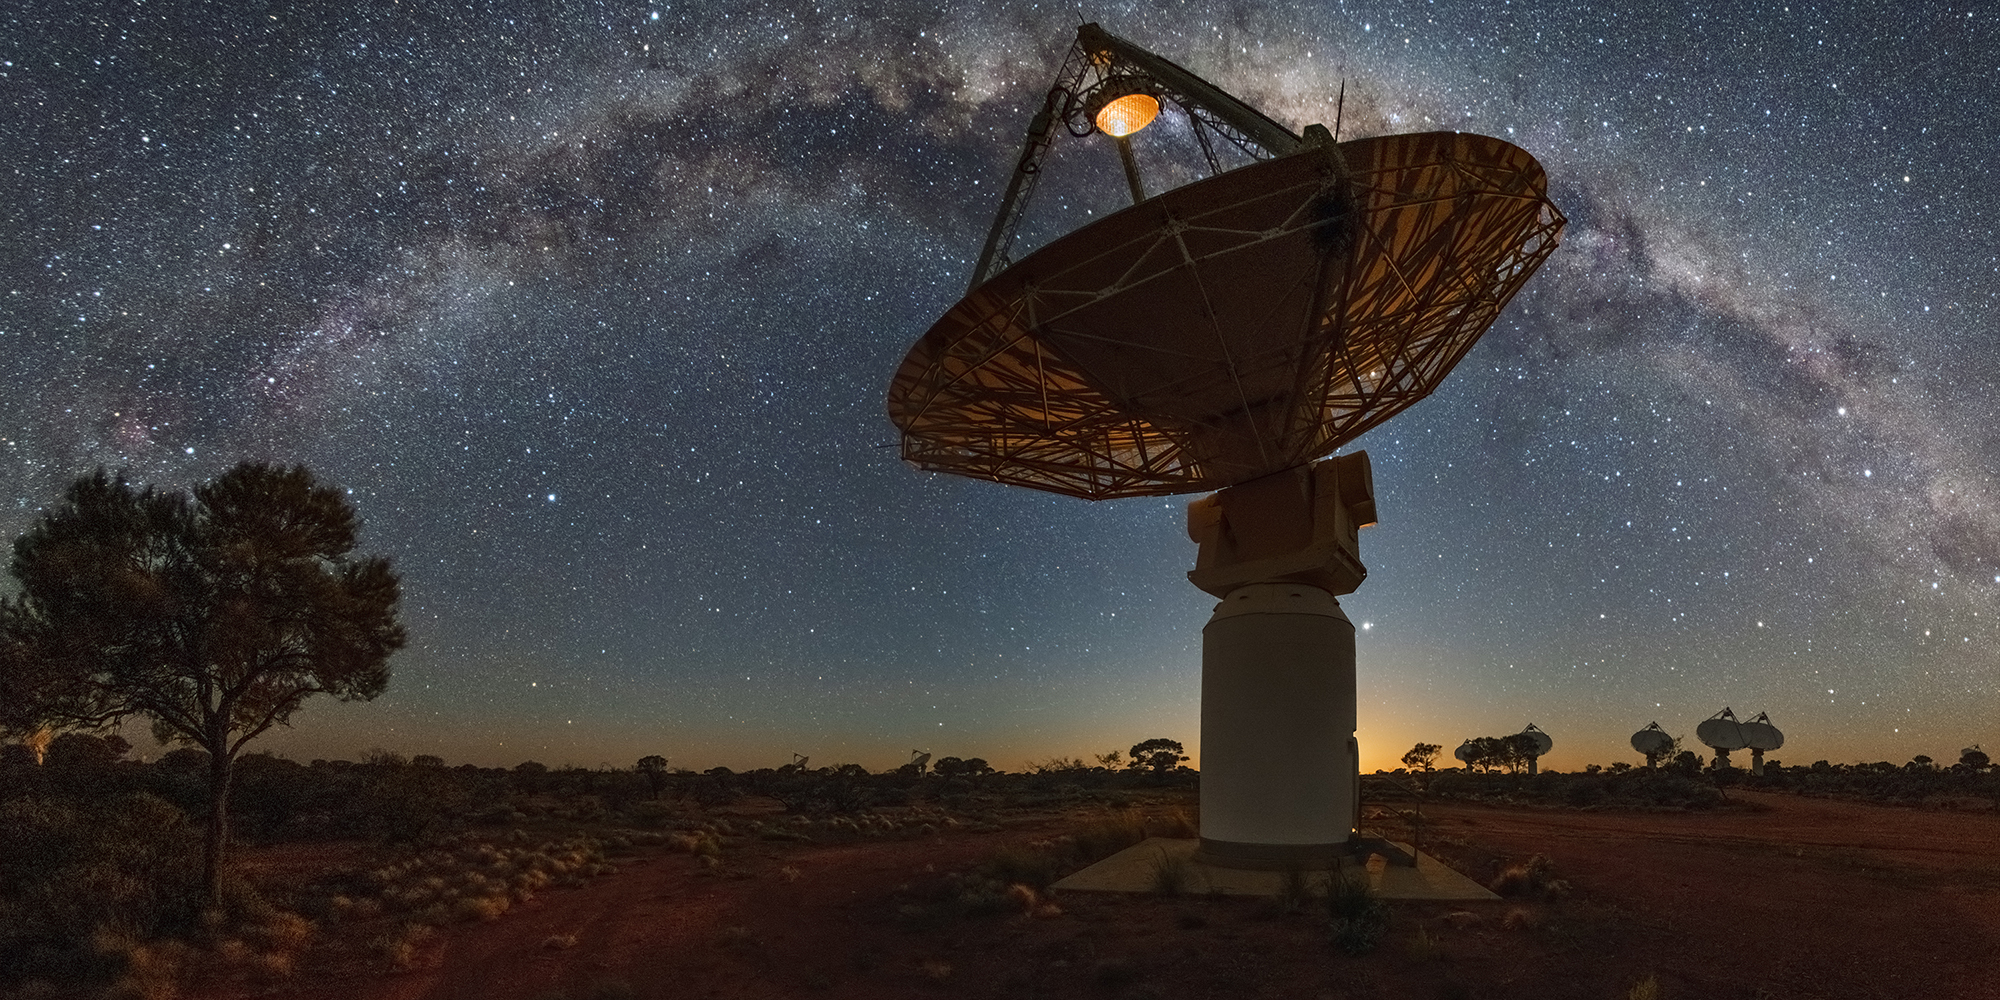 CSIRO's Australian Square Kilometre Array Pathfinder (ASKAP) telescope